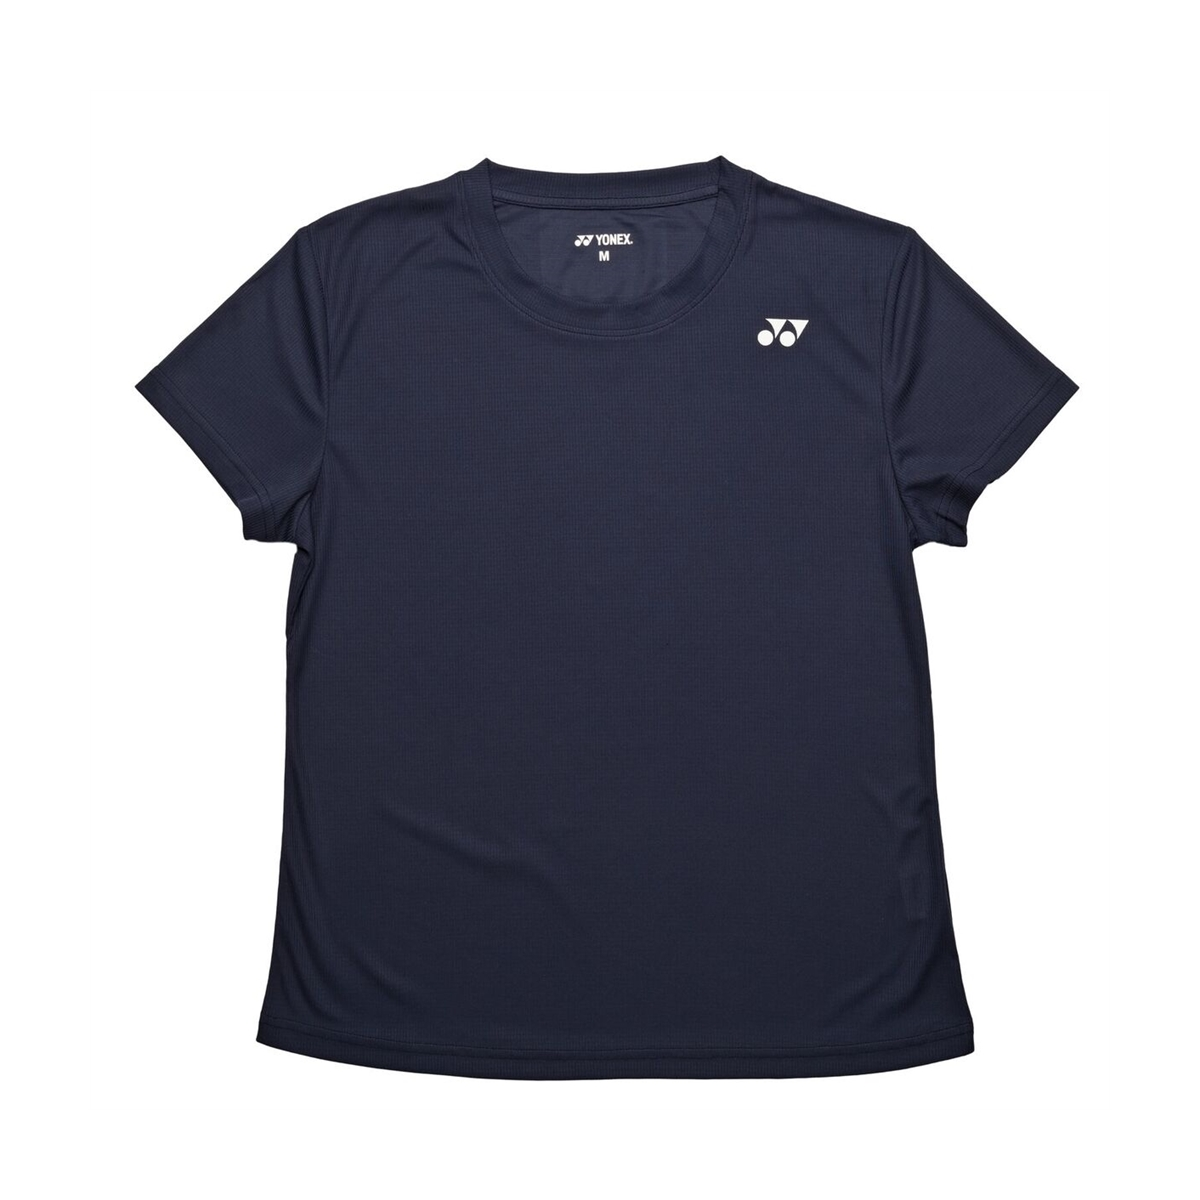 Yonex - Mia Womens Shirt 8-10 Year